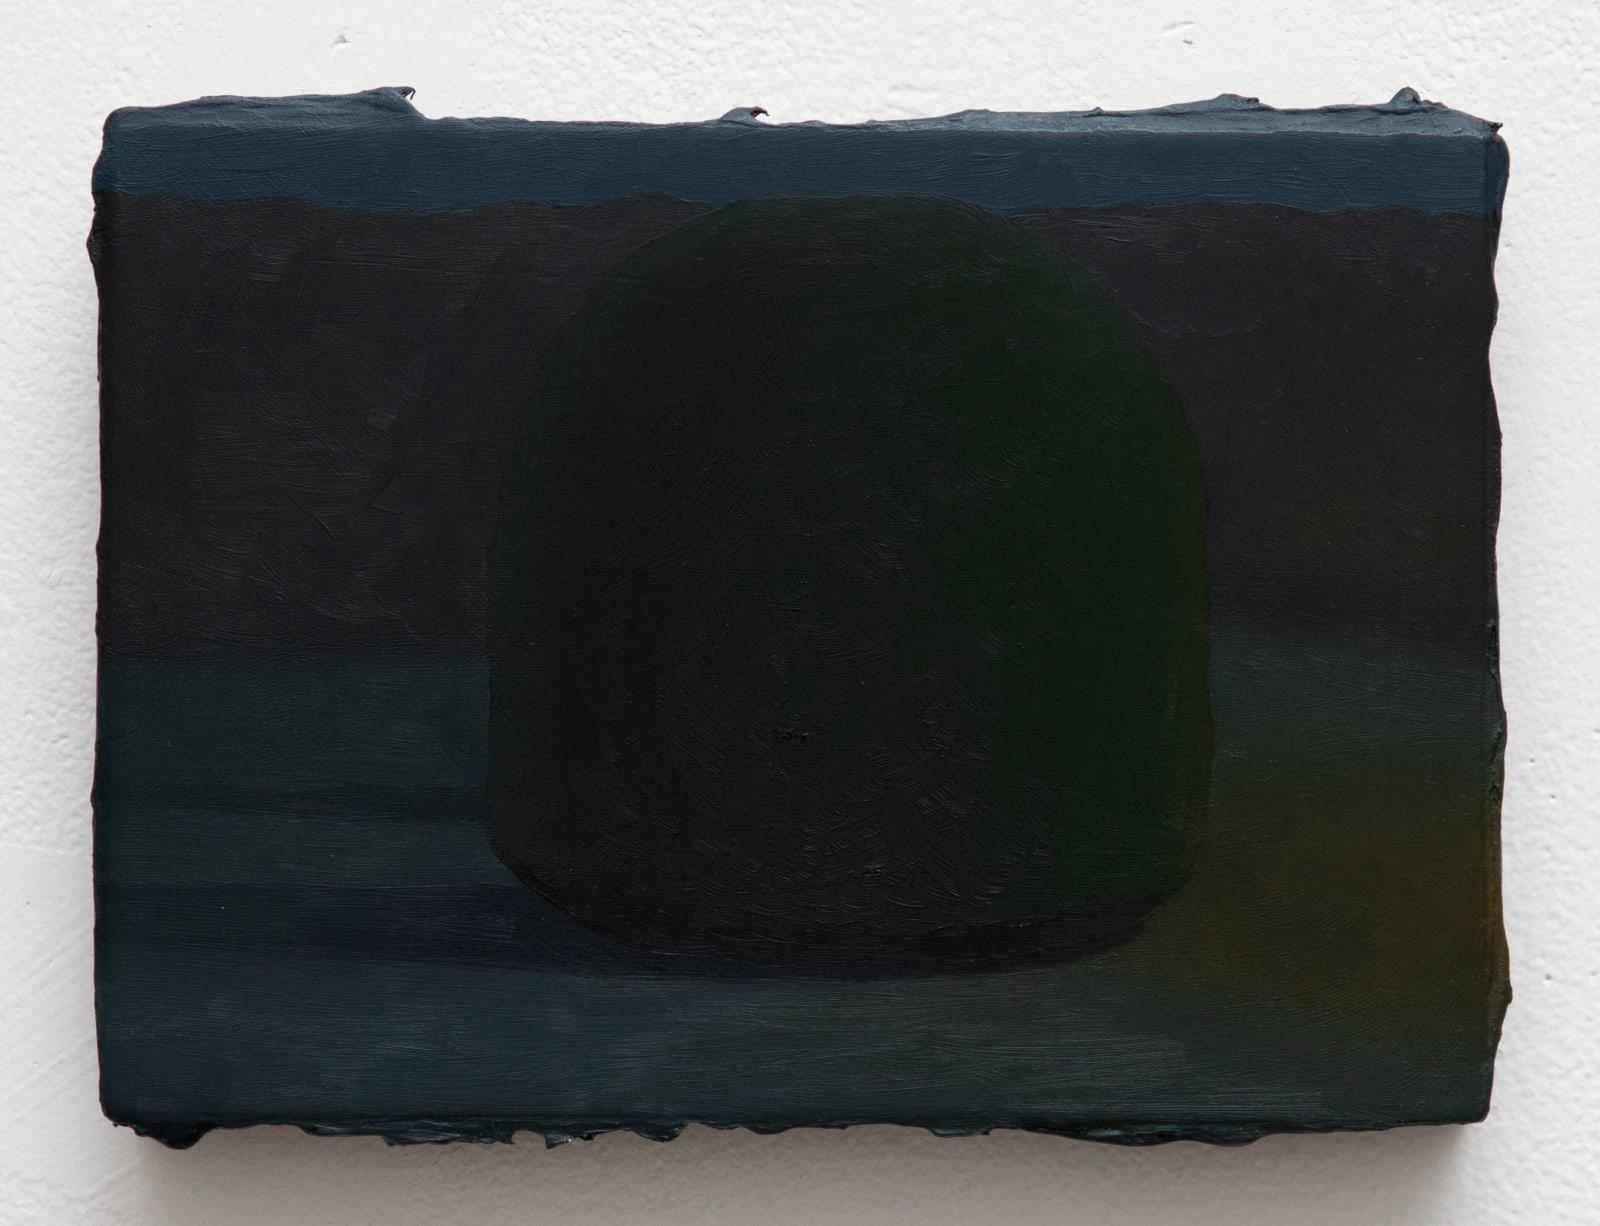 Sarah Schlesinger, Hidden Bush at Night, 2021